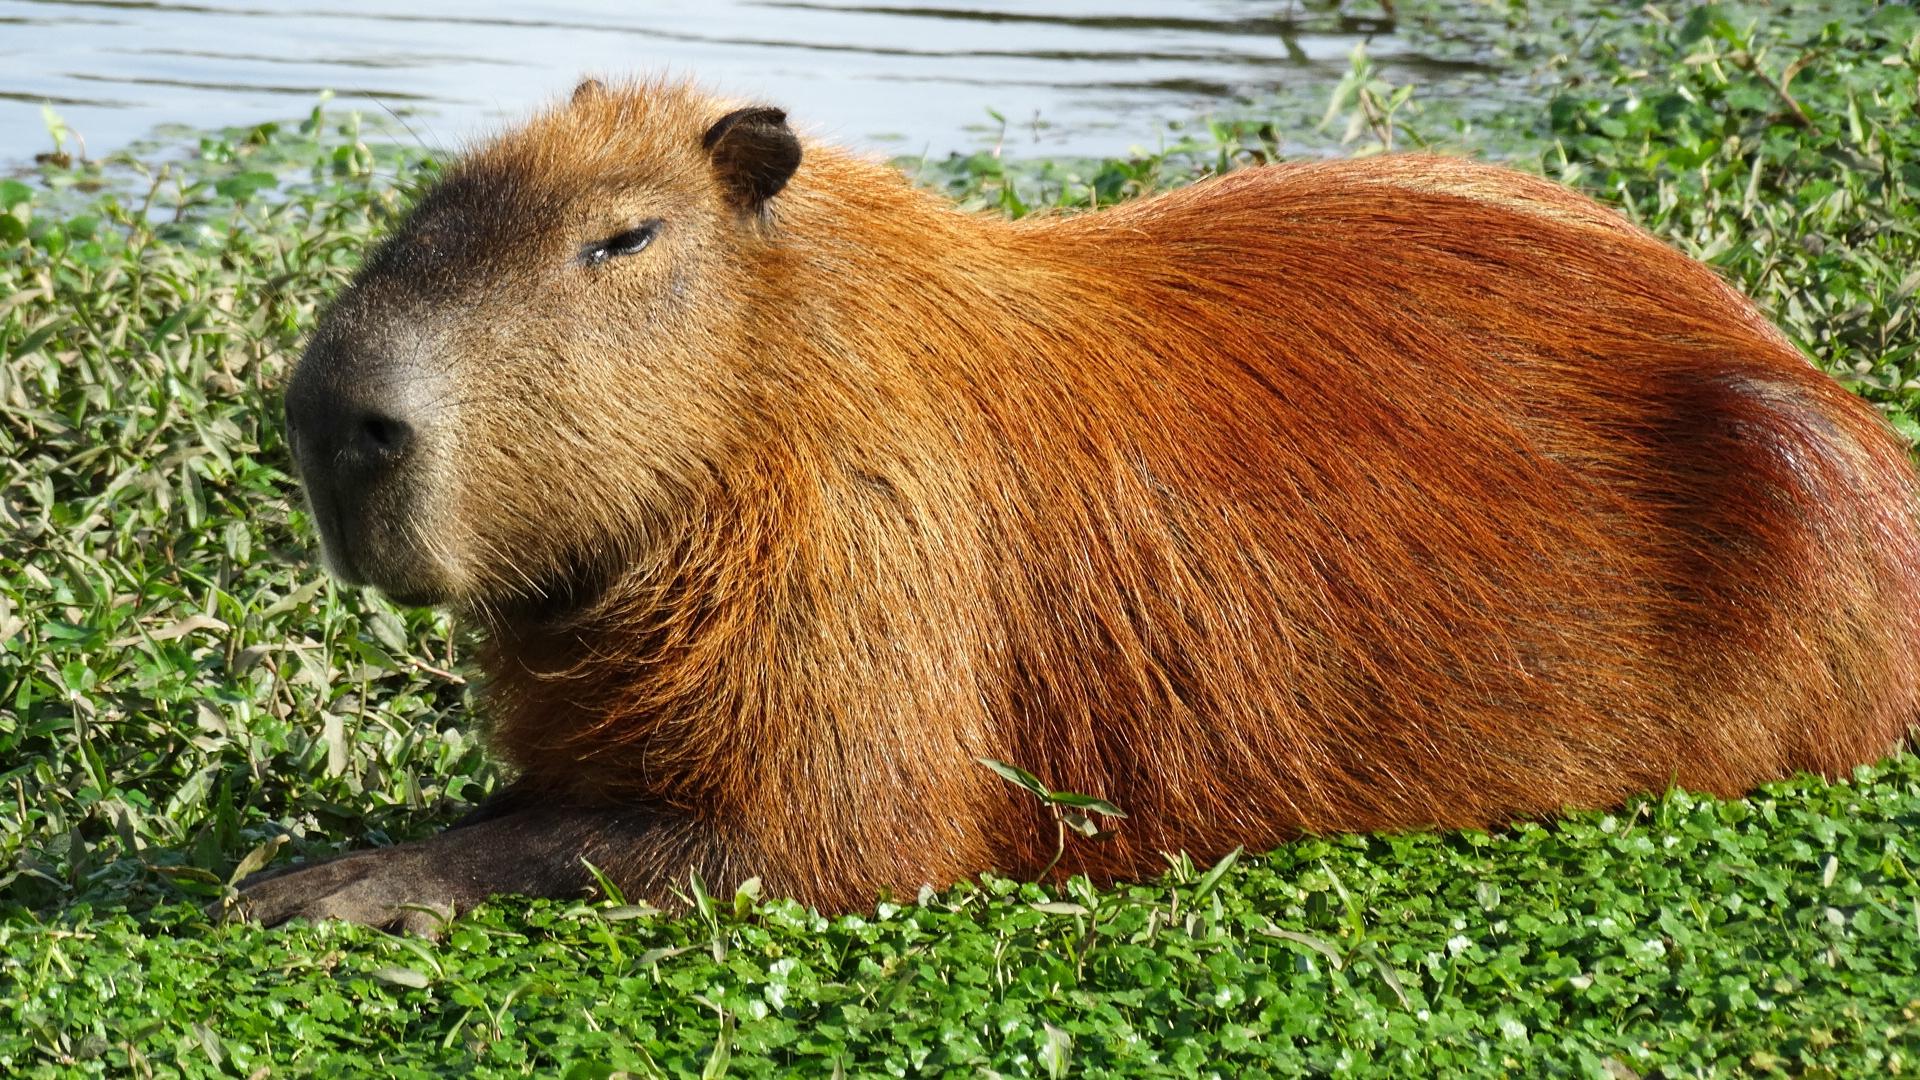 Capybara Hd Wallpaper